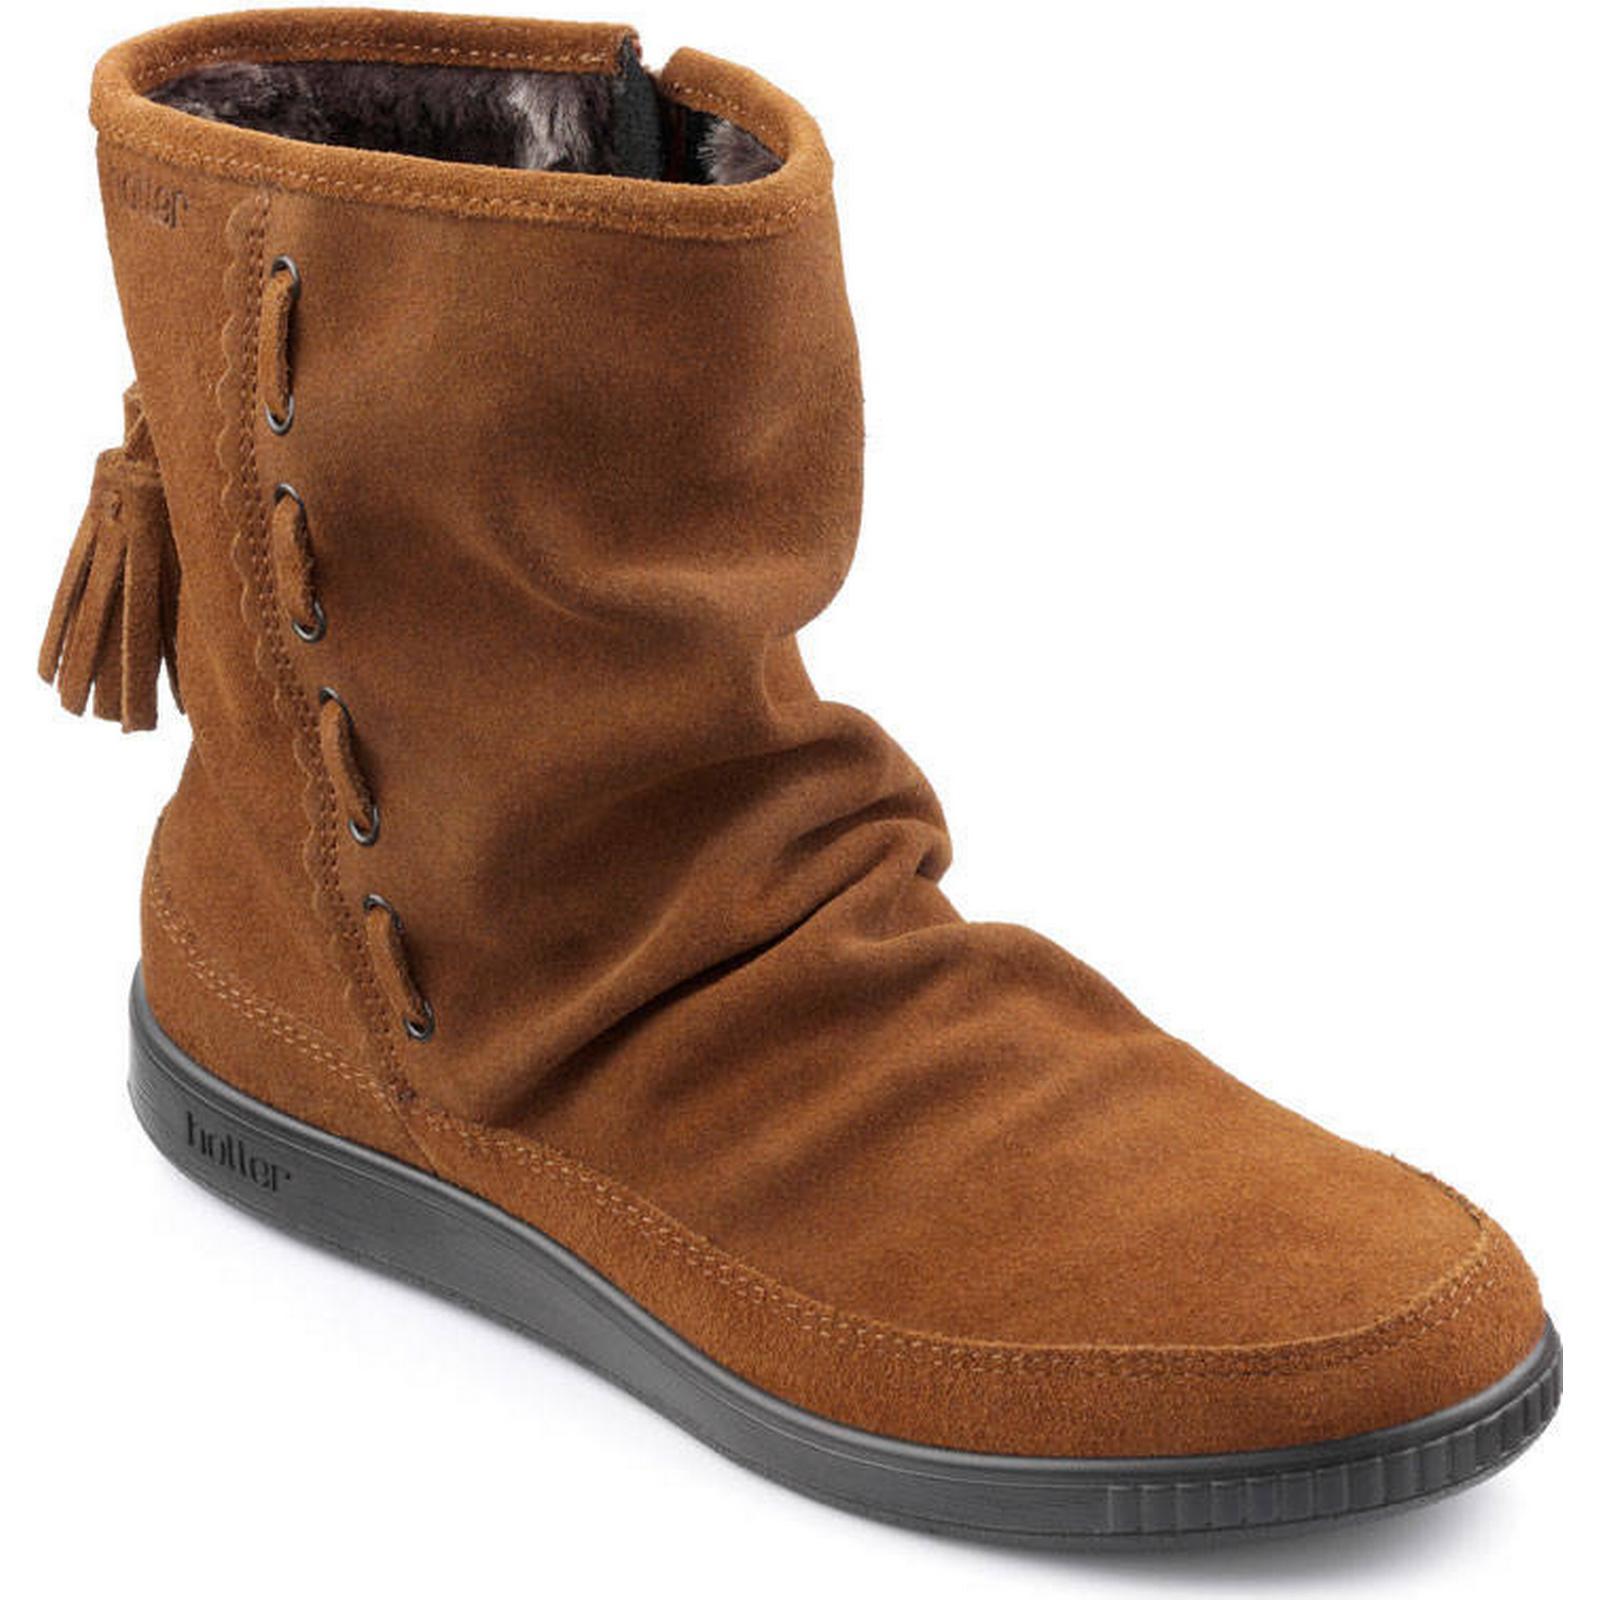 Pixie Boots Standard - Plum - Standard Boots Fit - 6.5 7d6cb3